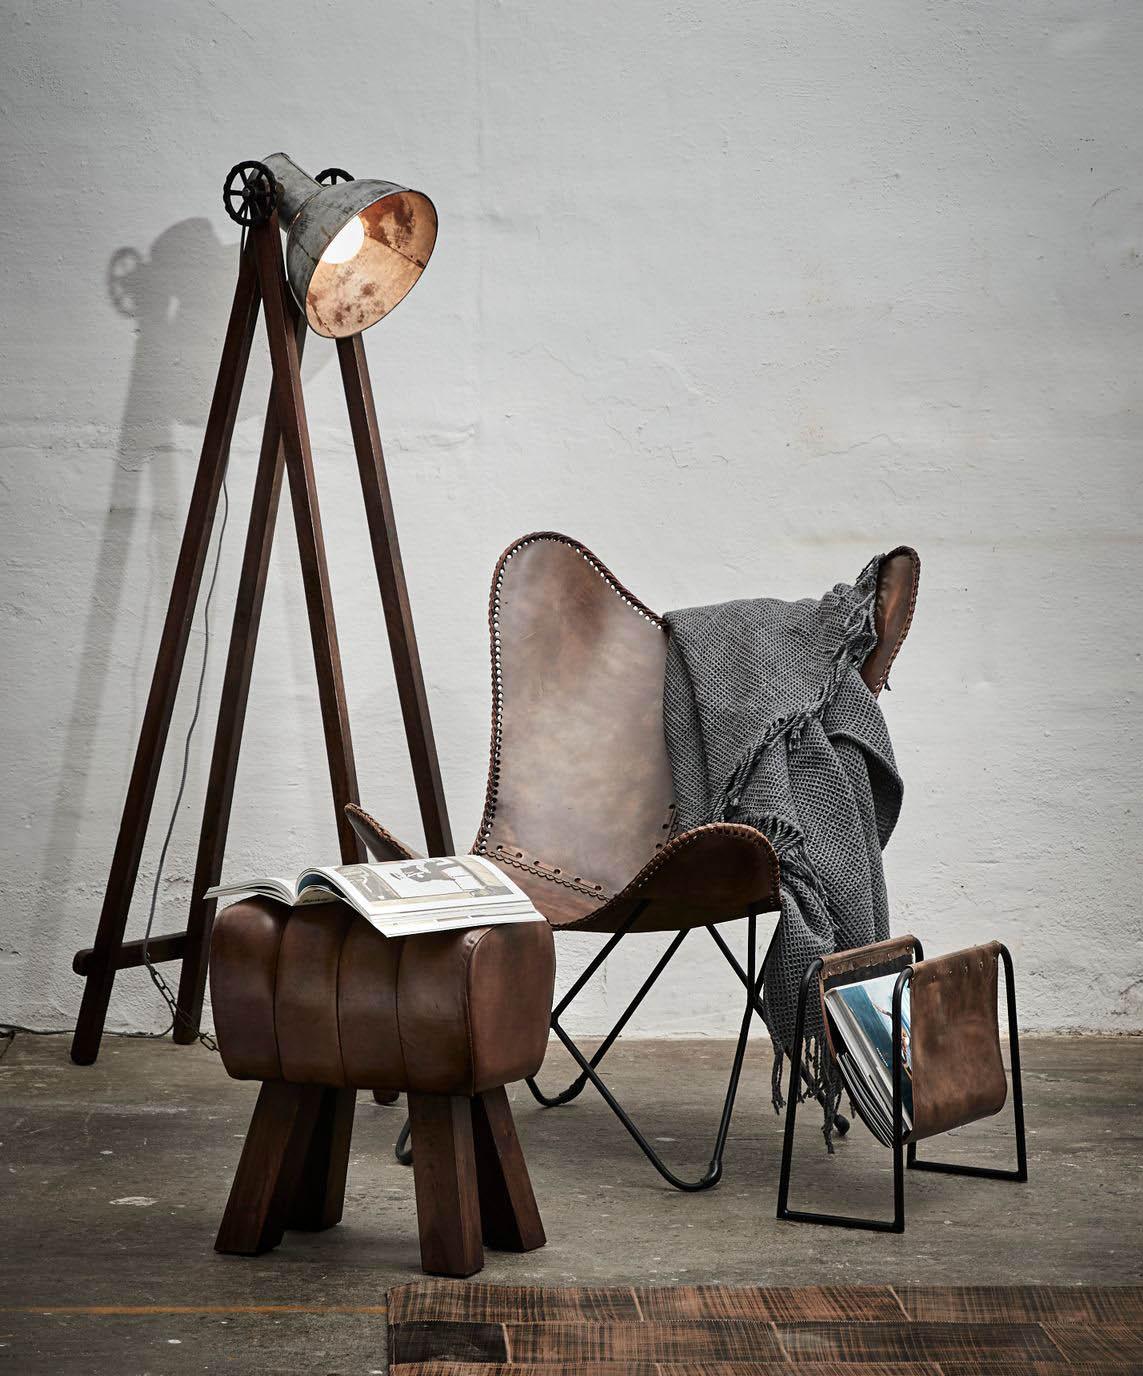 FUHRHOME Amazon butterfly stol, patina, ægte læder Unika